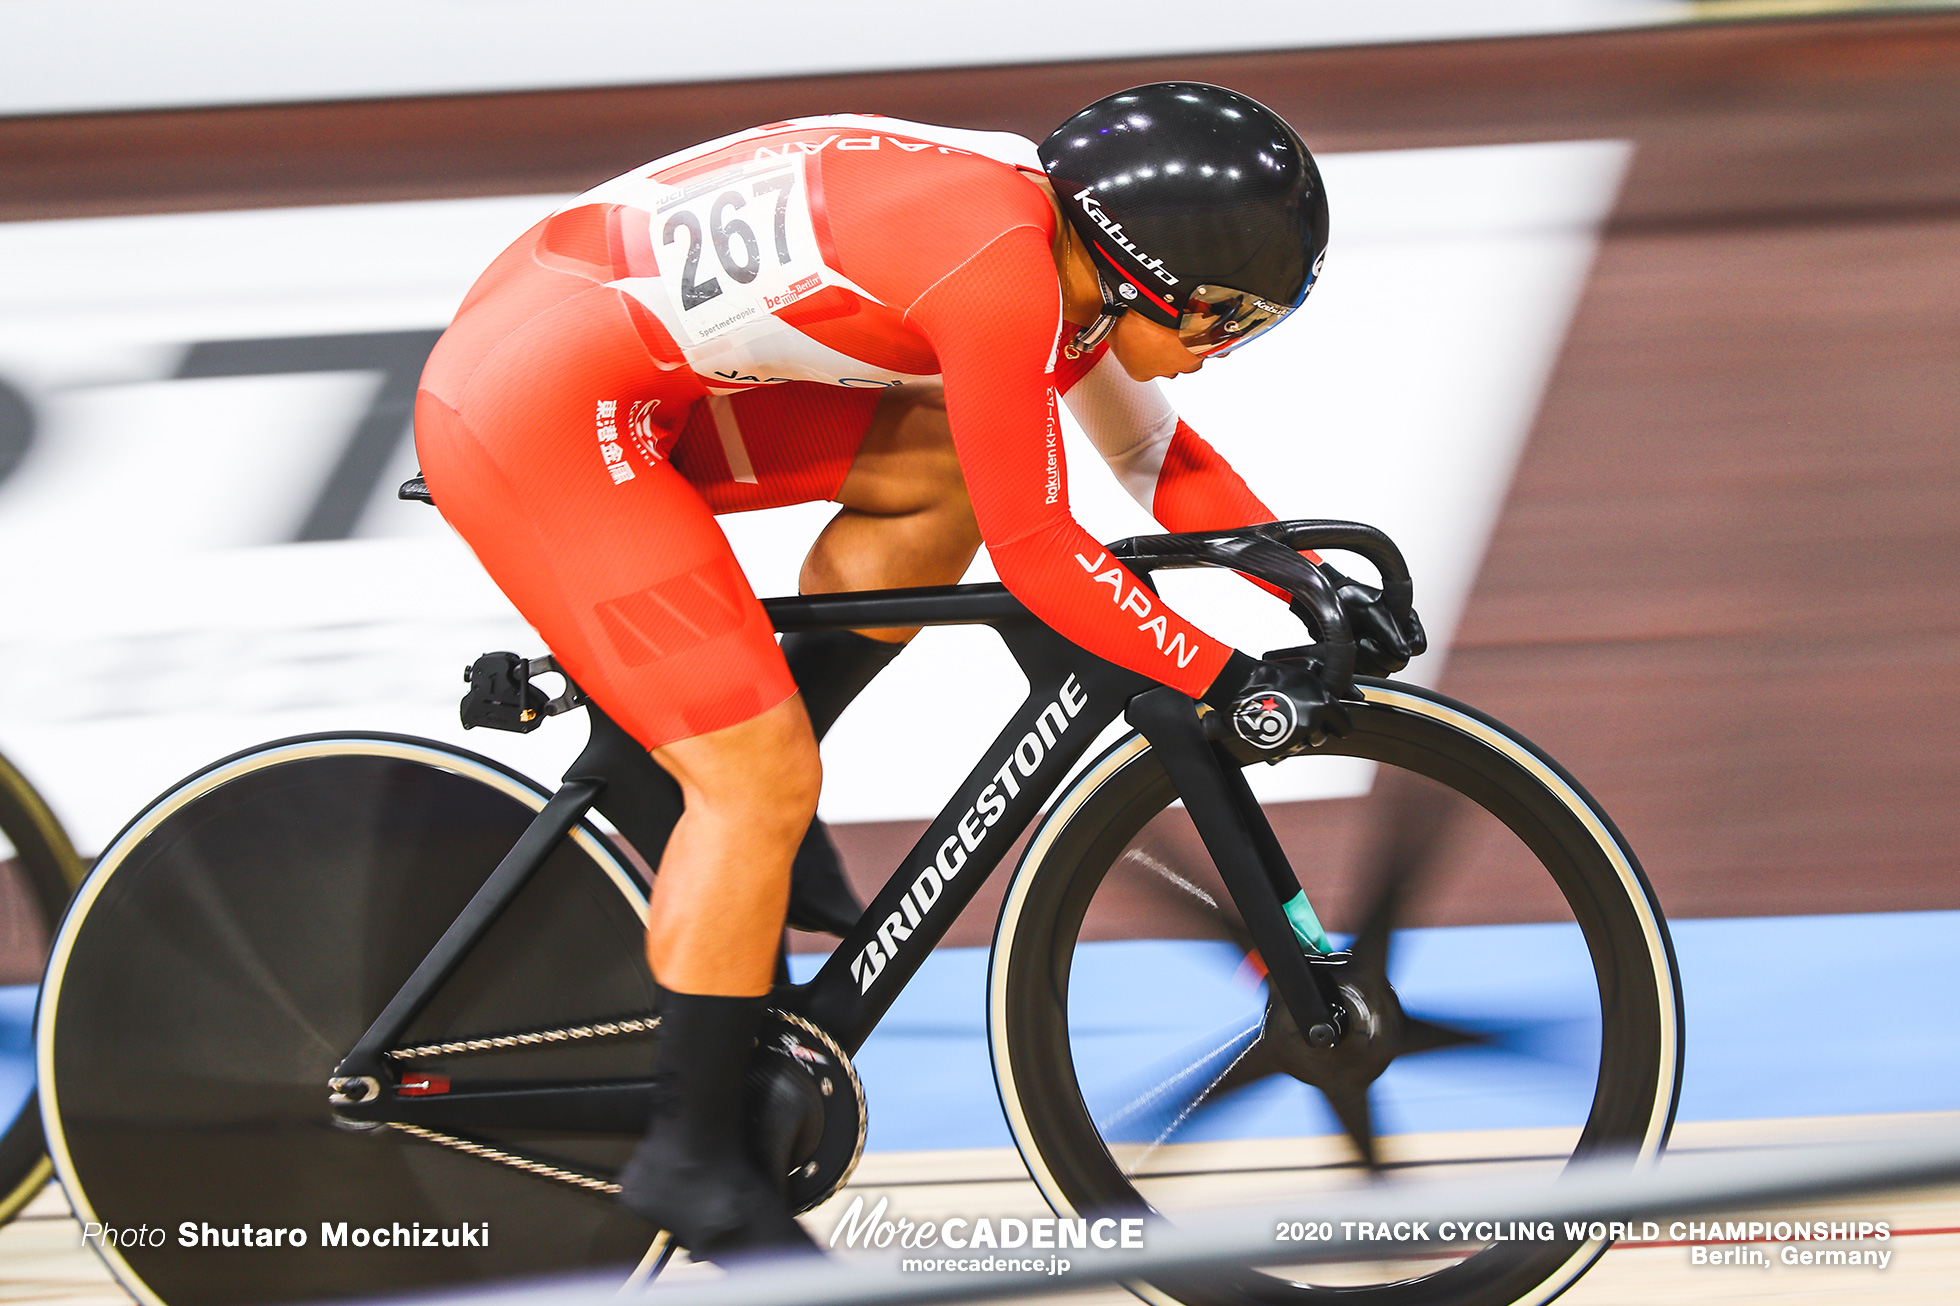 1st Round Repechage / Women's Keirin / 2020 Track Cycling World Championships, Ohta Riyu 太田りゆ